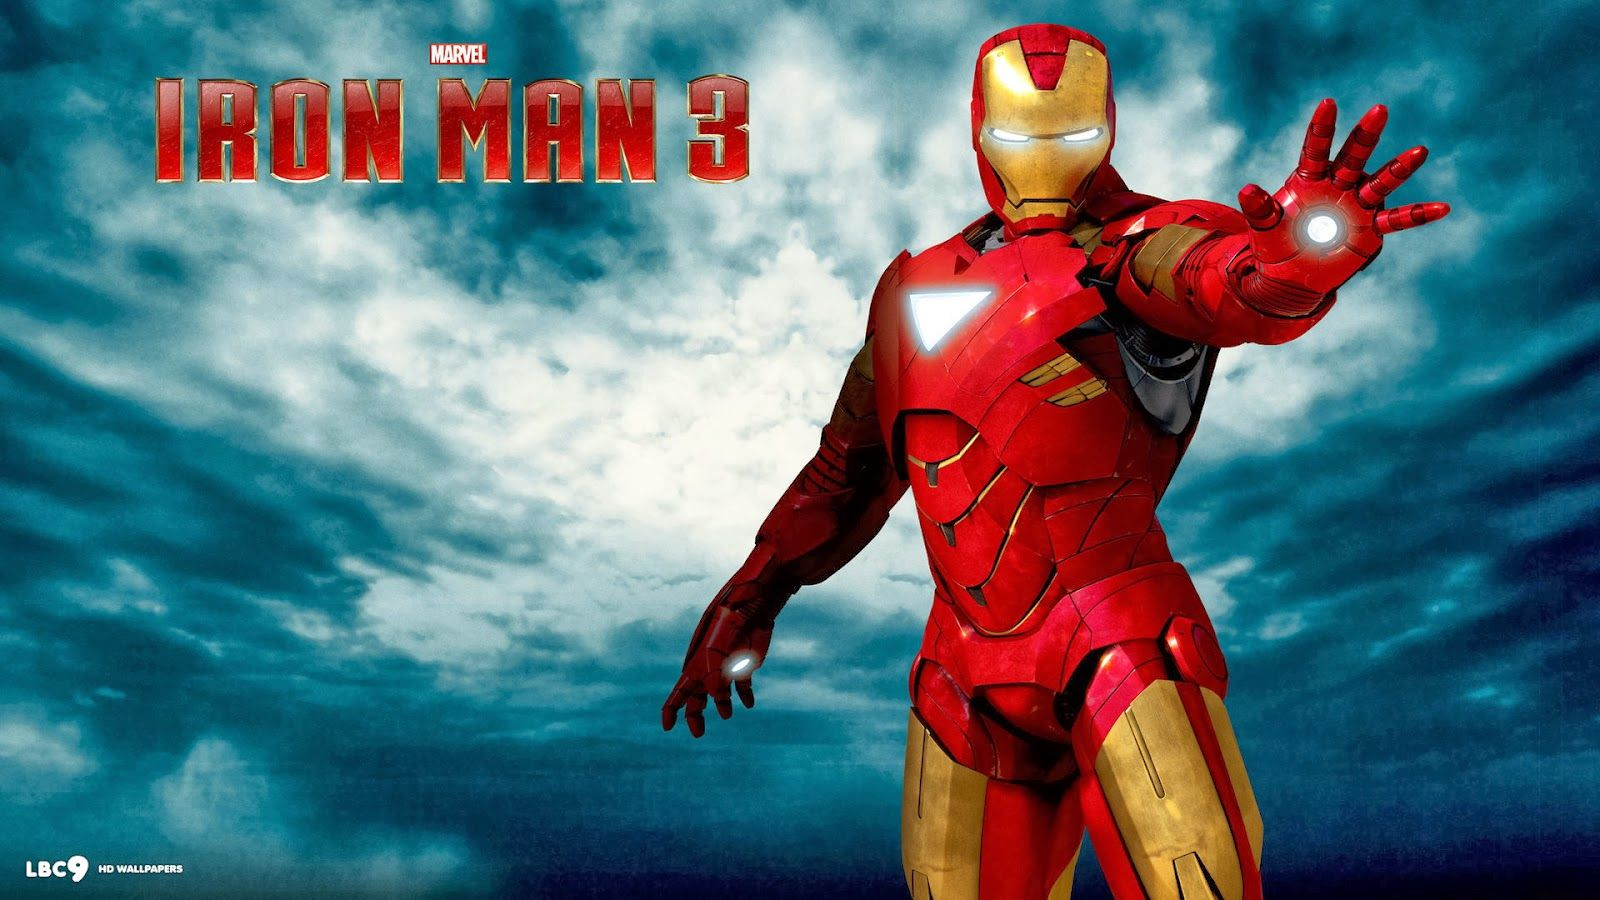 HD wallpapers: Iron Man 3 HD Wallpaper